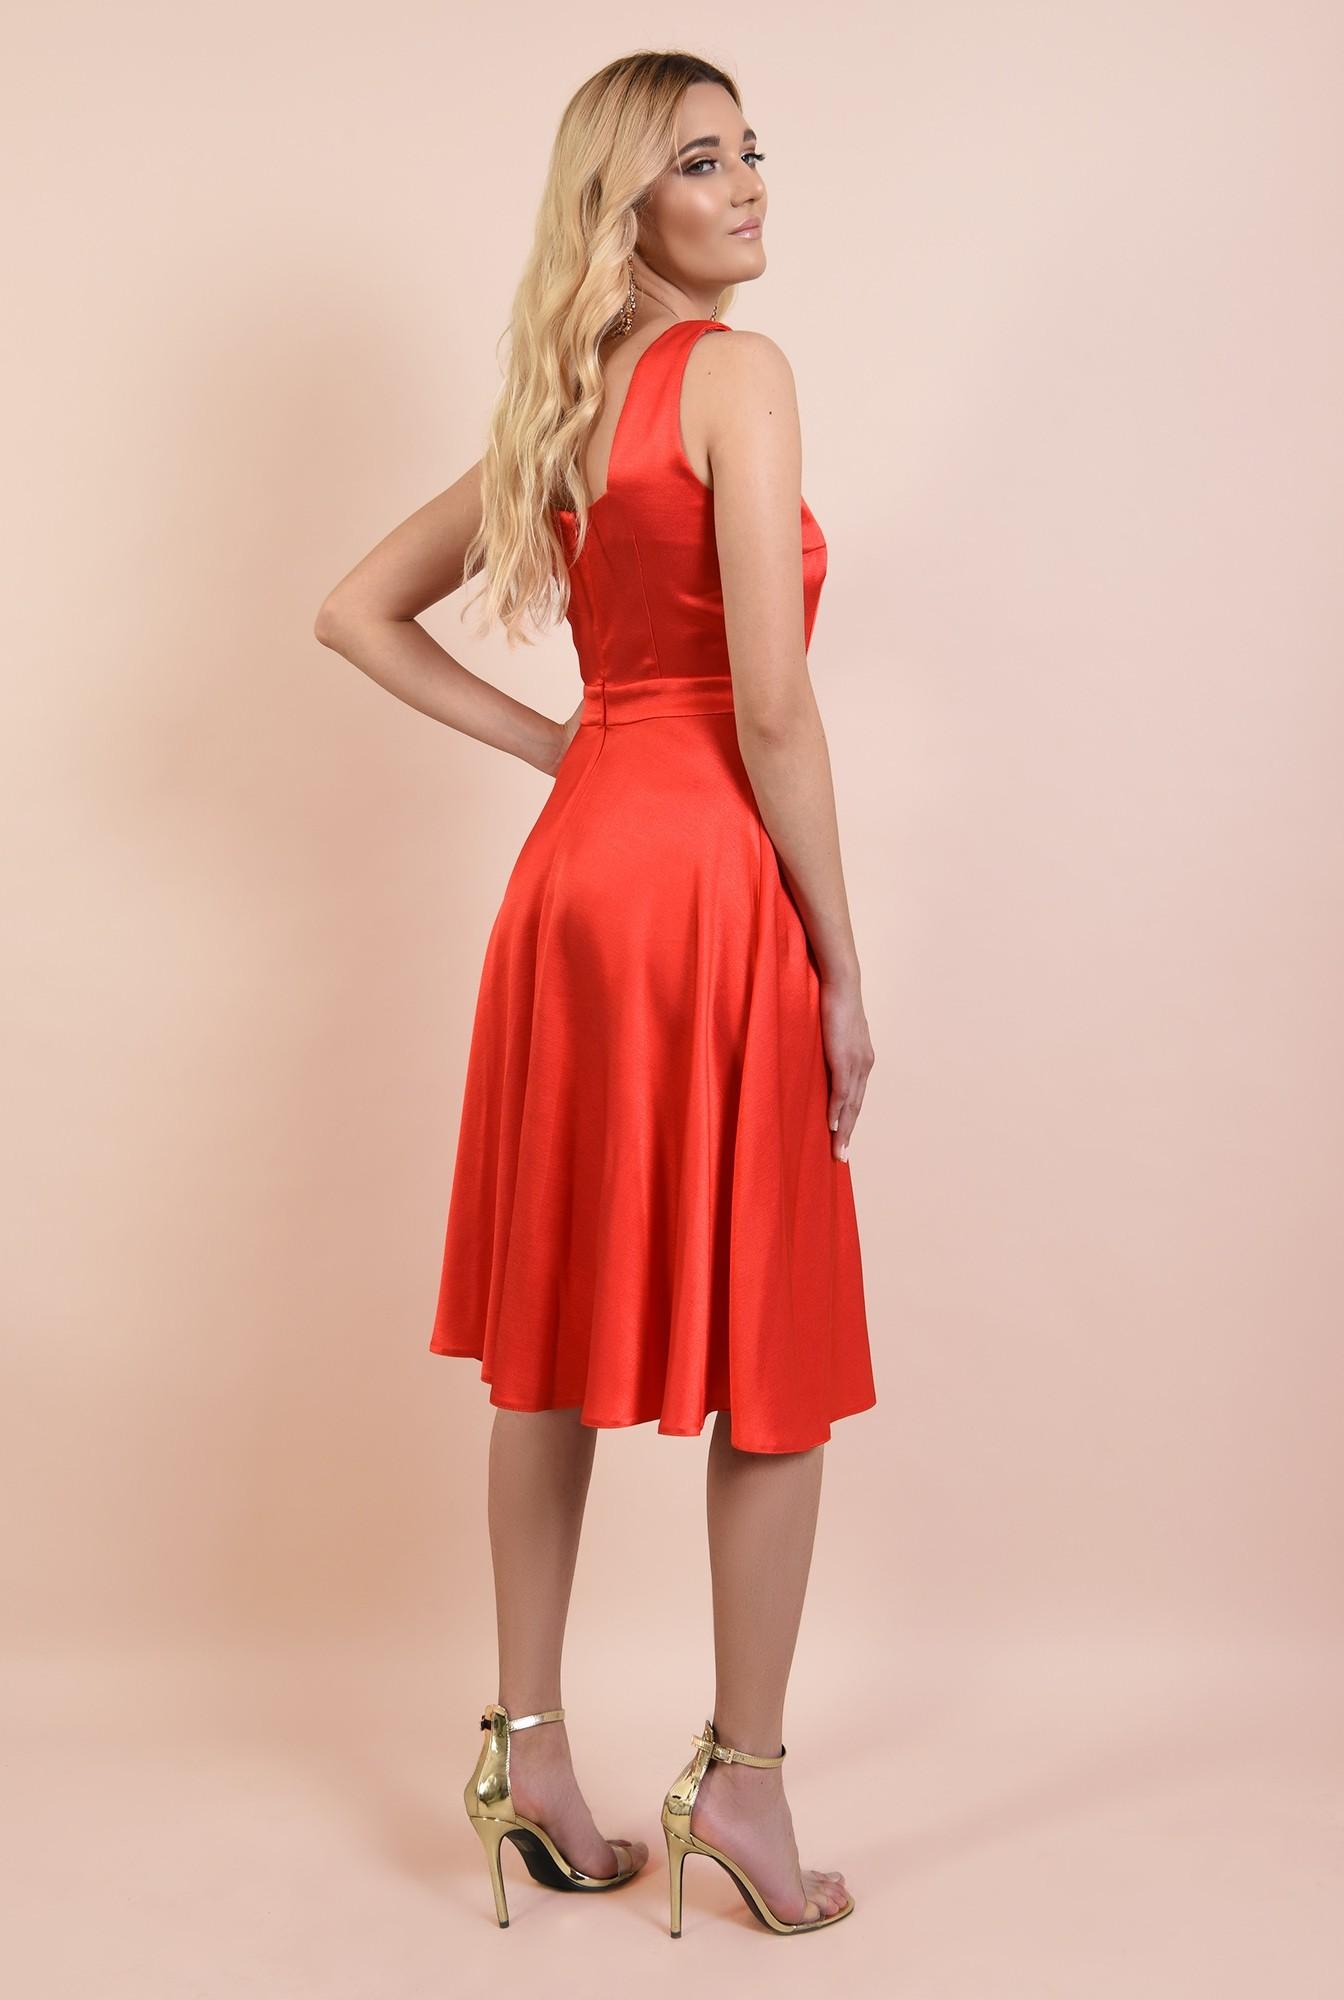 1 - rochie de ocazie, Poema, corai, cu bretele, evazata, rochii online